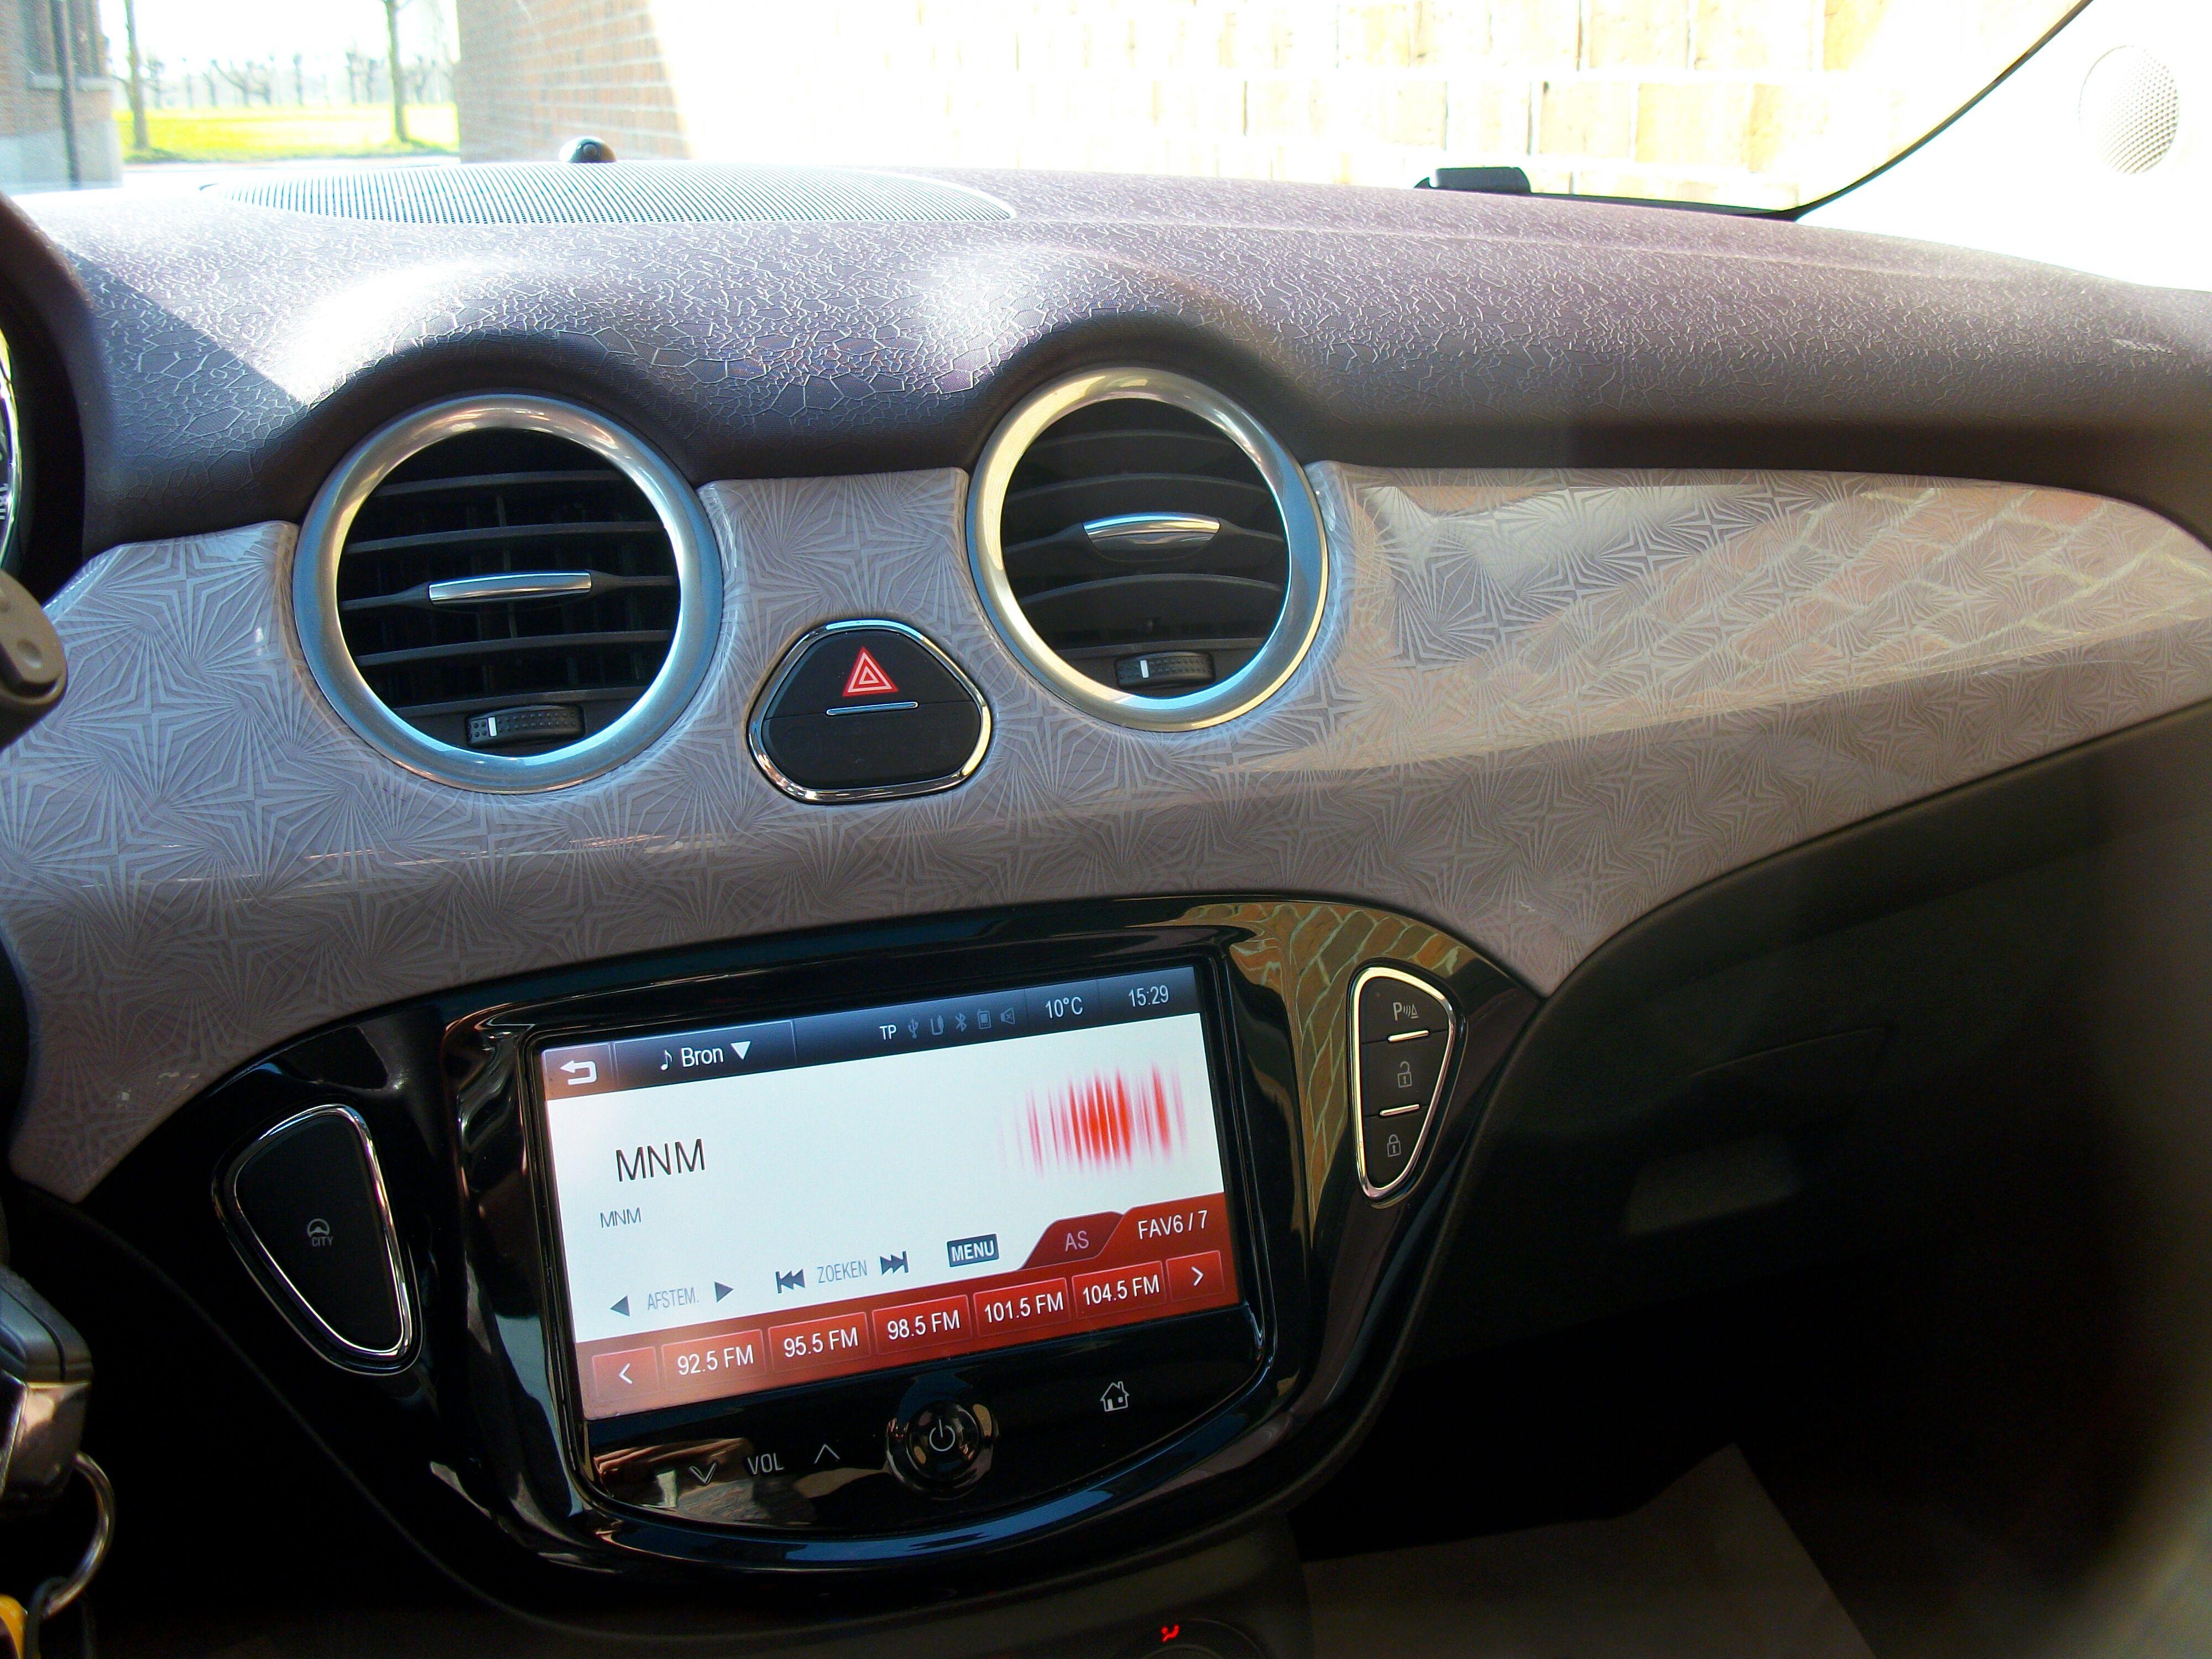 Opel ADAM SLAM 1.2 Benz. - weinig kilometers 5/12